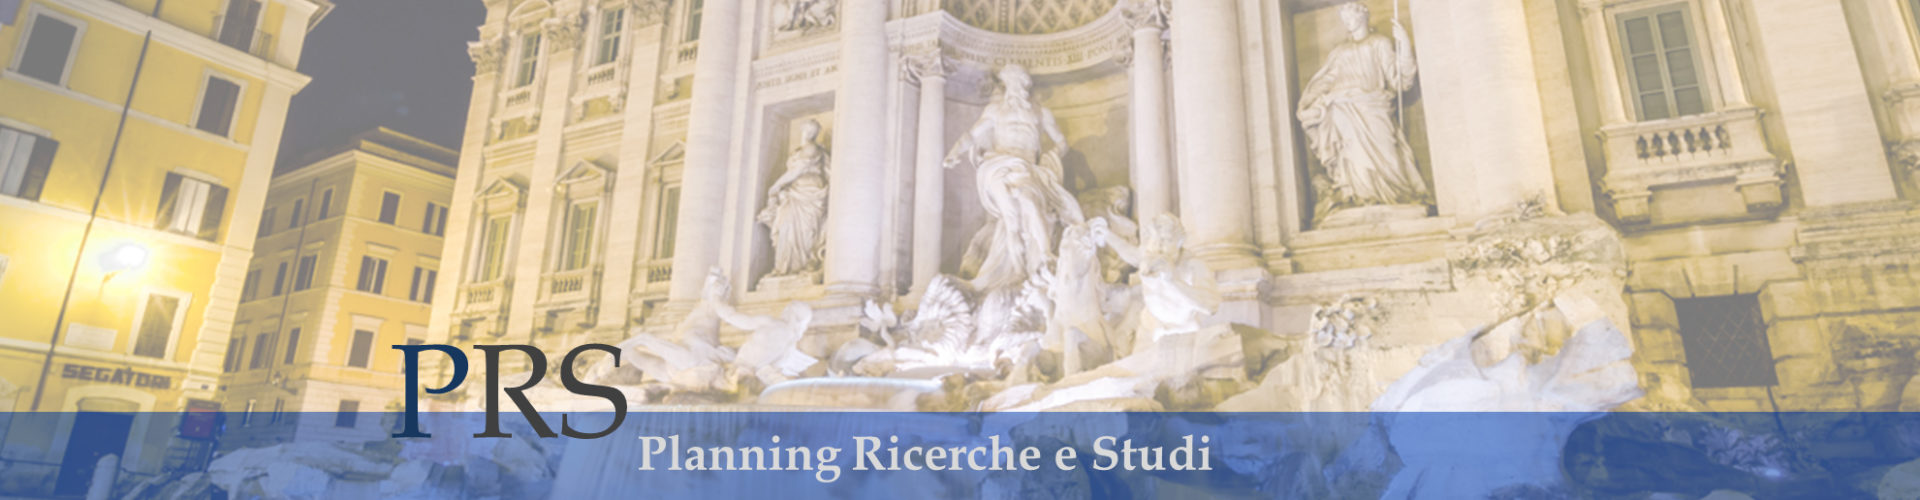 PRS Planning Ricerche e Studi